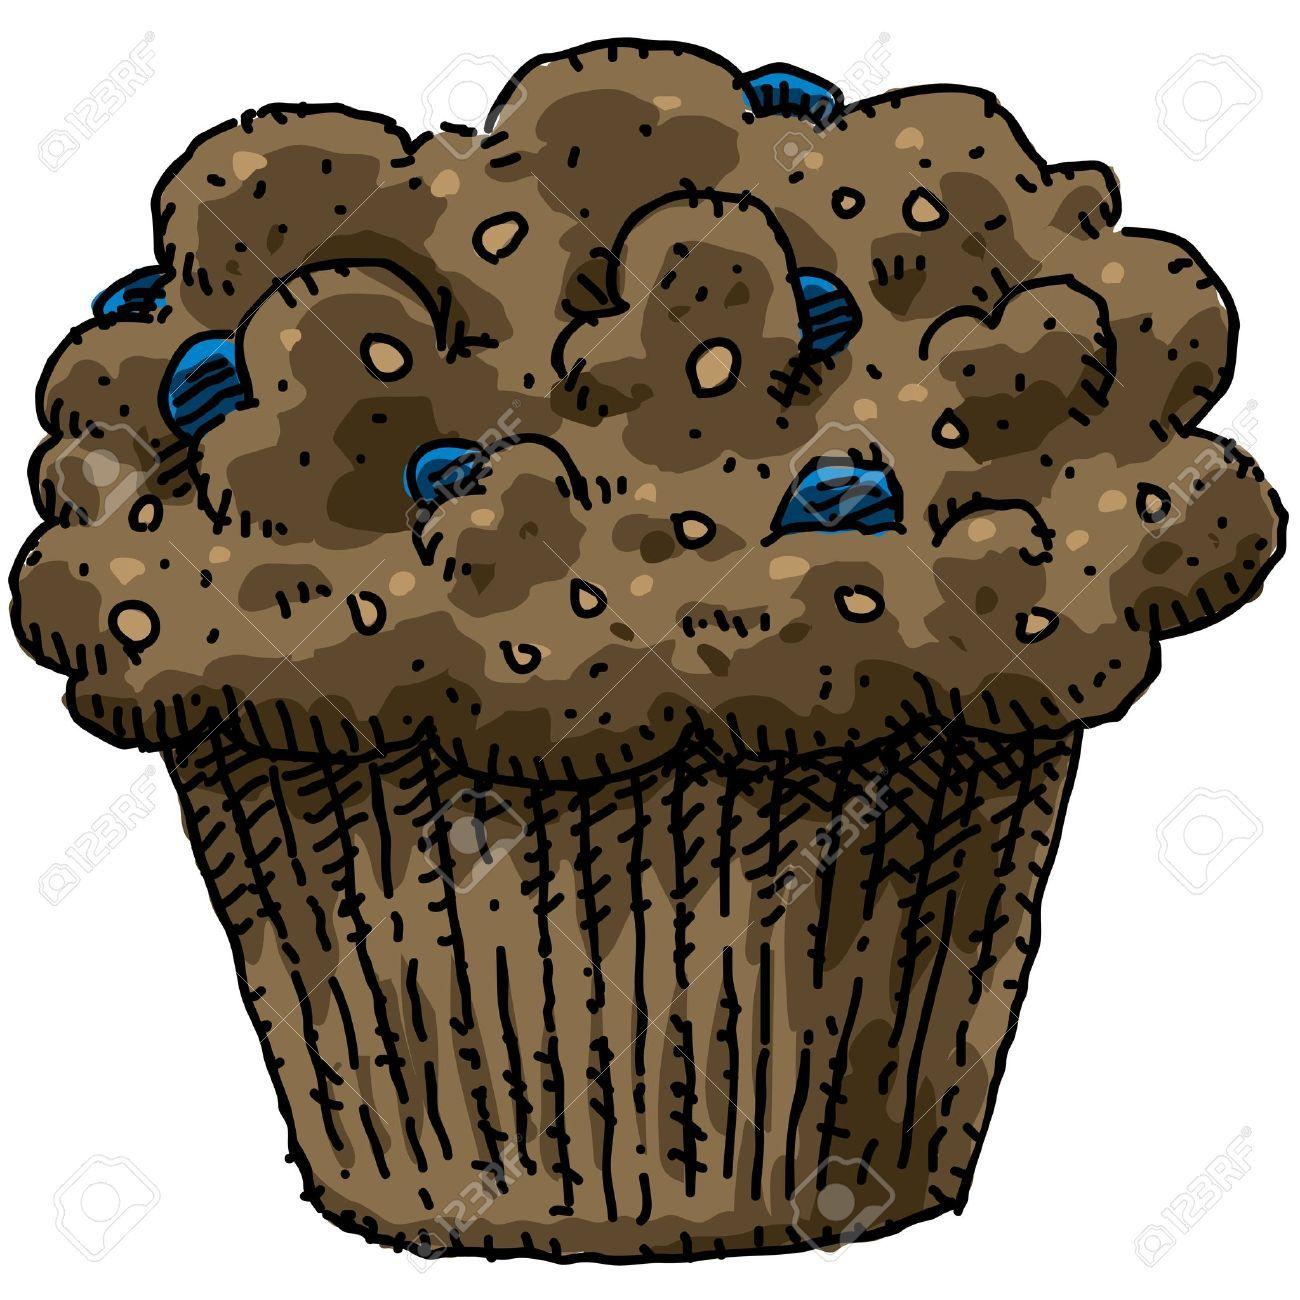 Stock photo gift ideas. Muffin clipart bran muffin